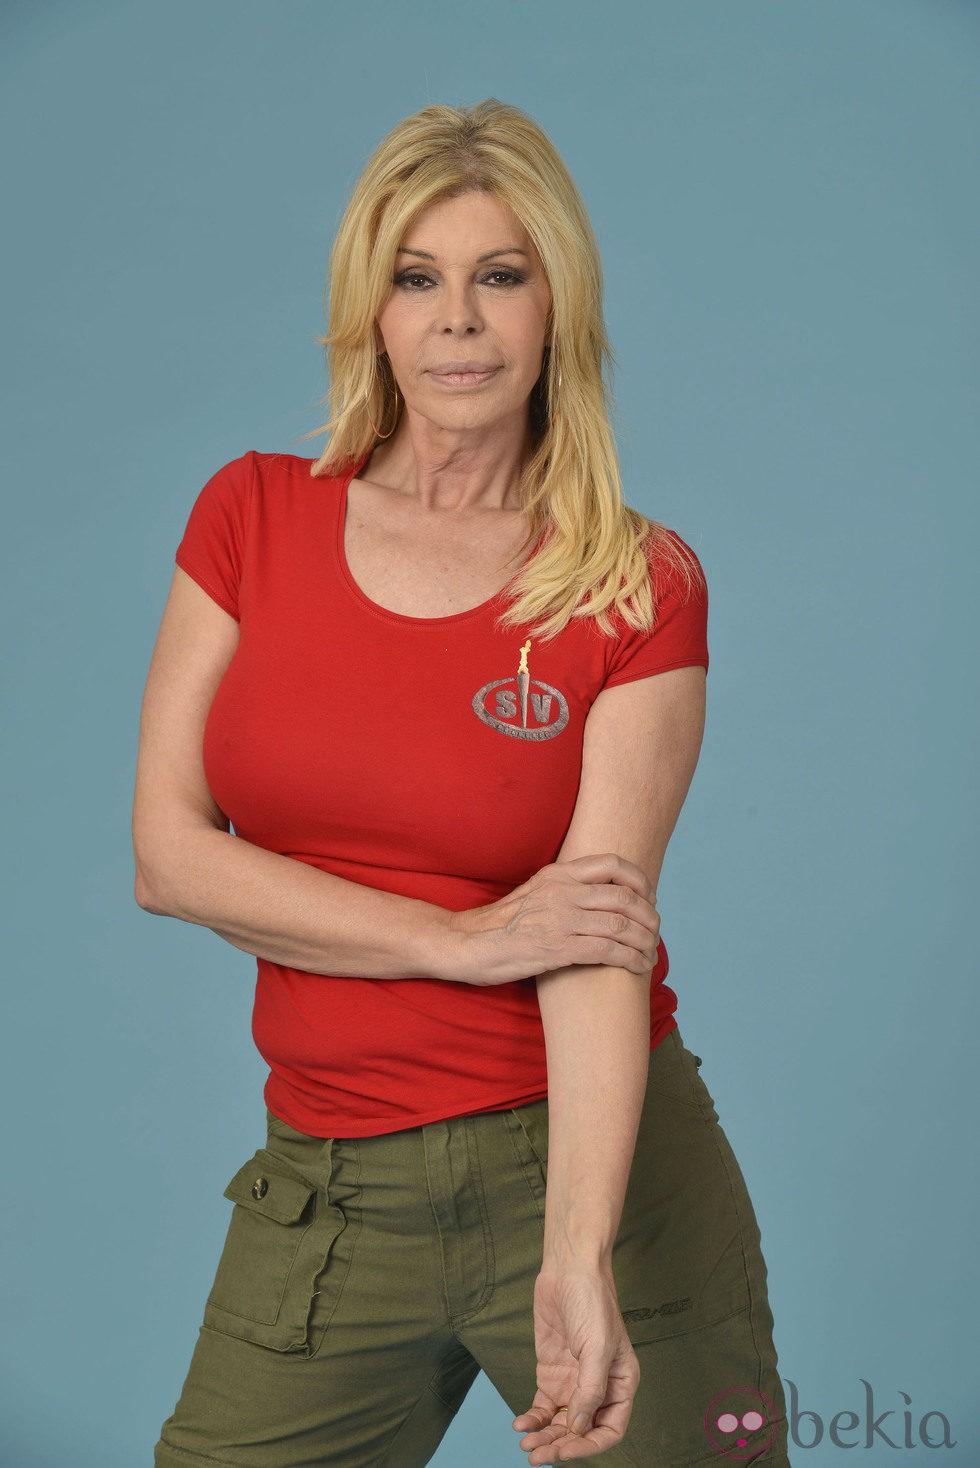 Bibiana Fernández posando como concursante de 'Supervivientes 2014'